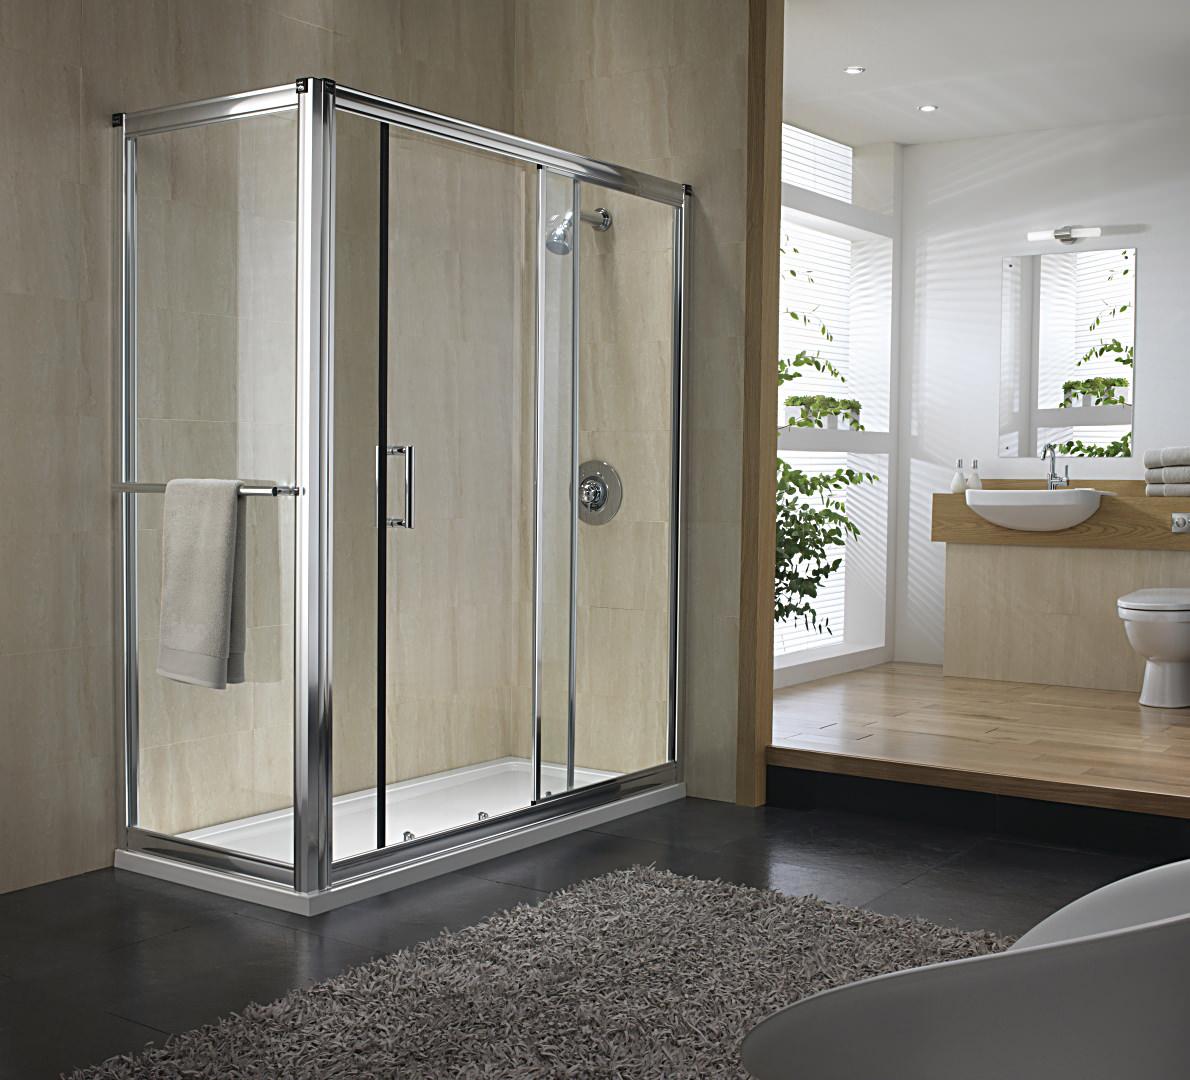 & Twyford Hydr8 Sliding Shower Door 1200mm